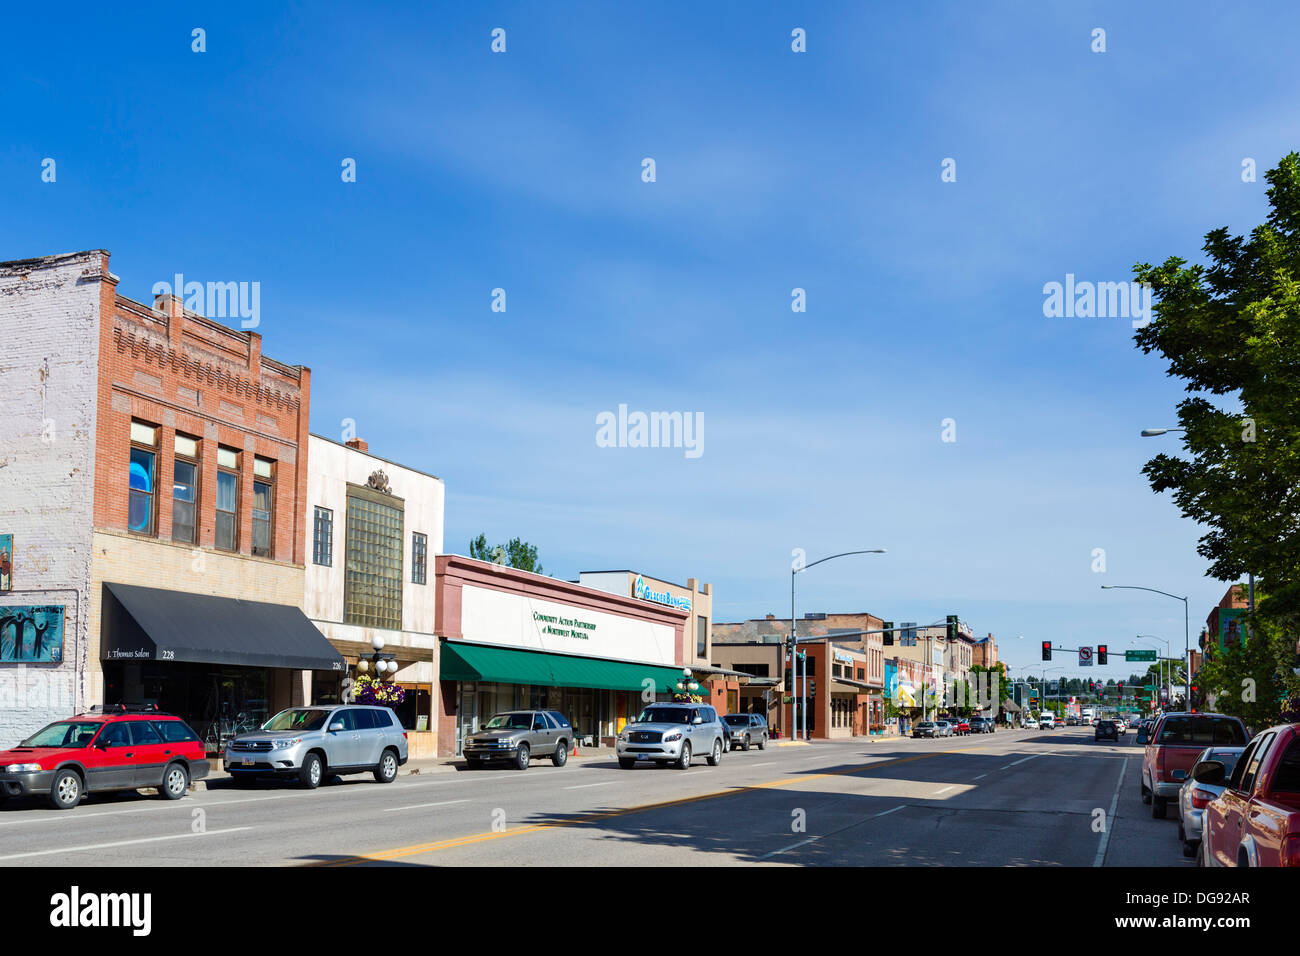 Main Street in Kalispell, Montana, USA - Stock Image